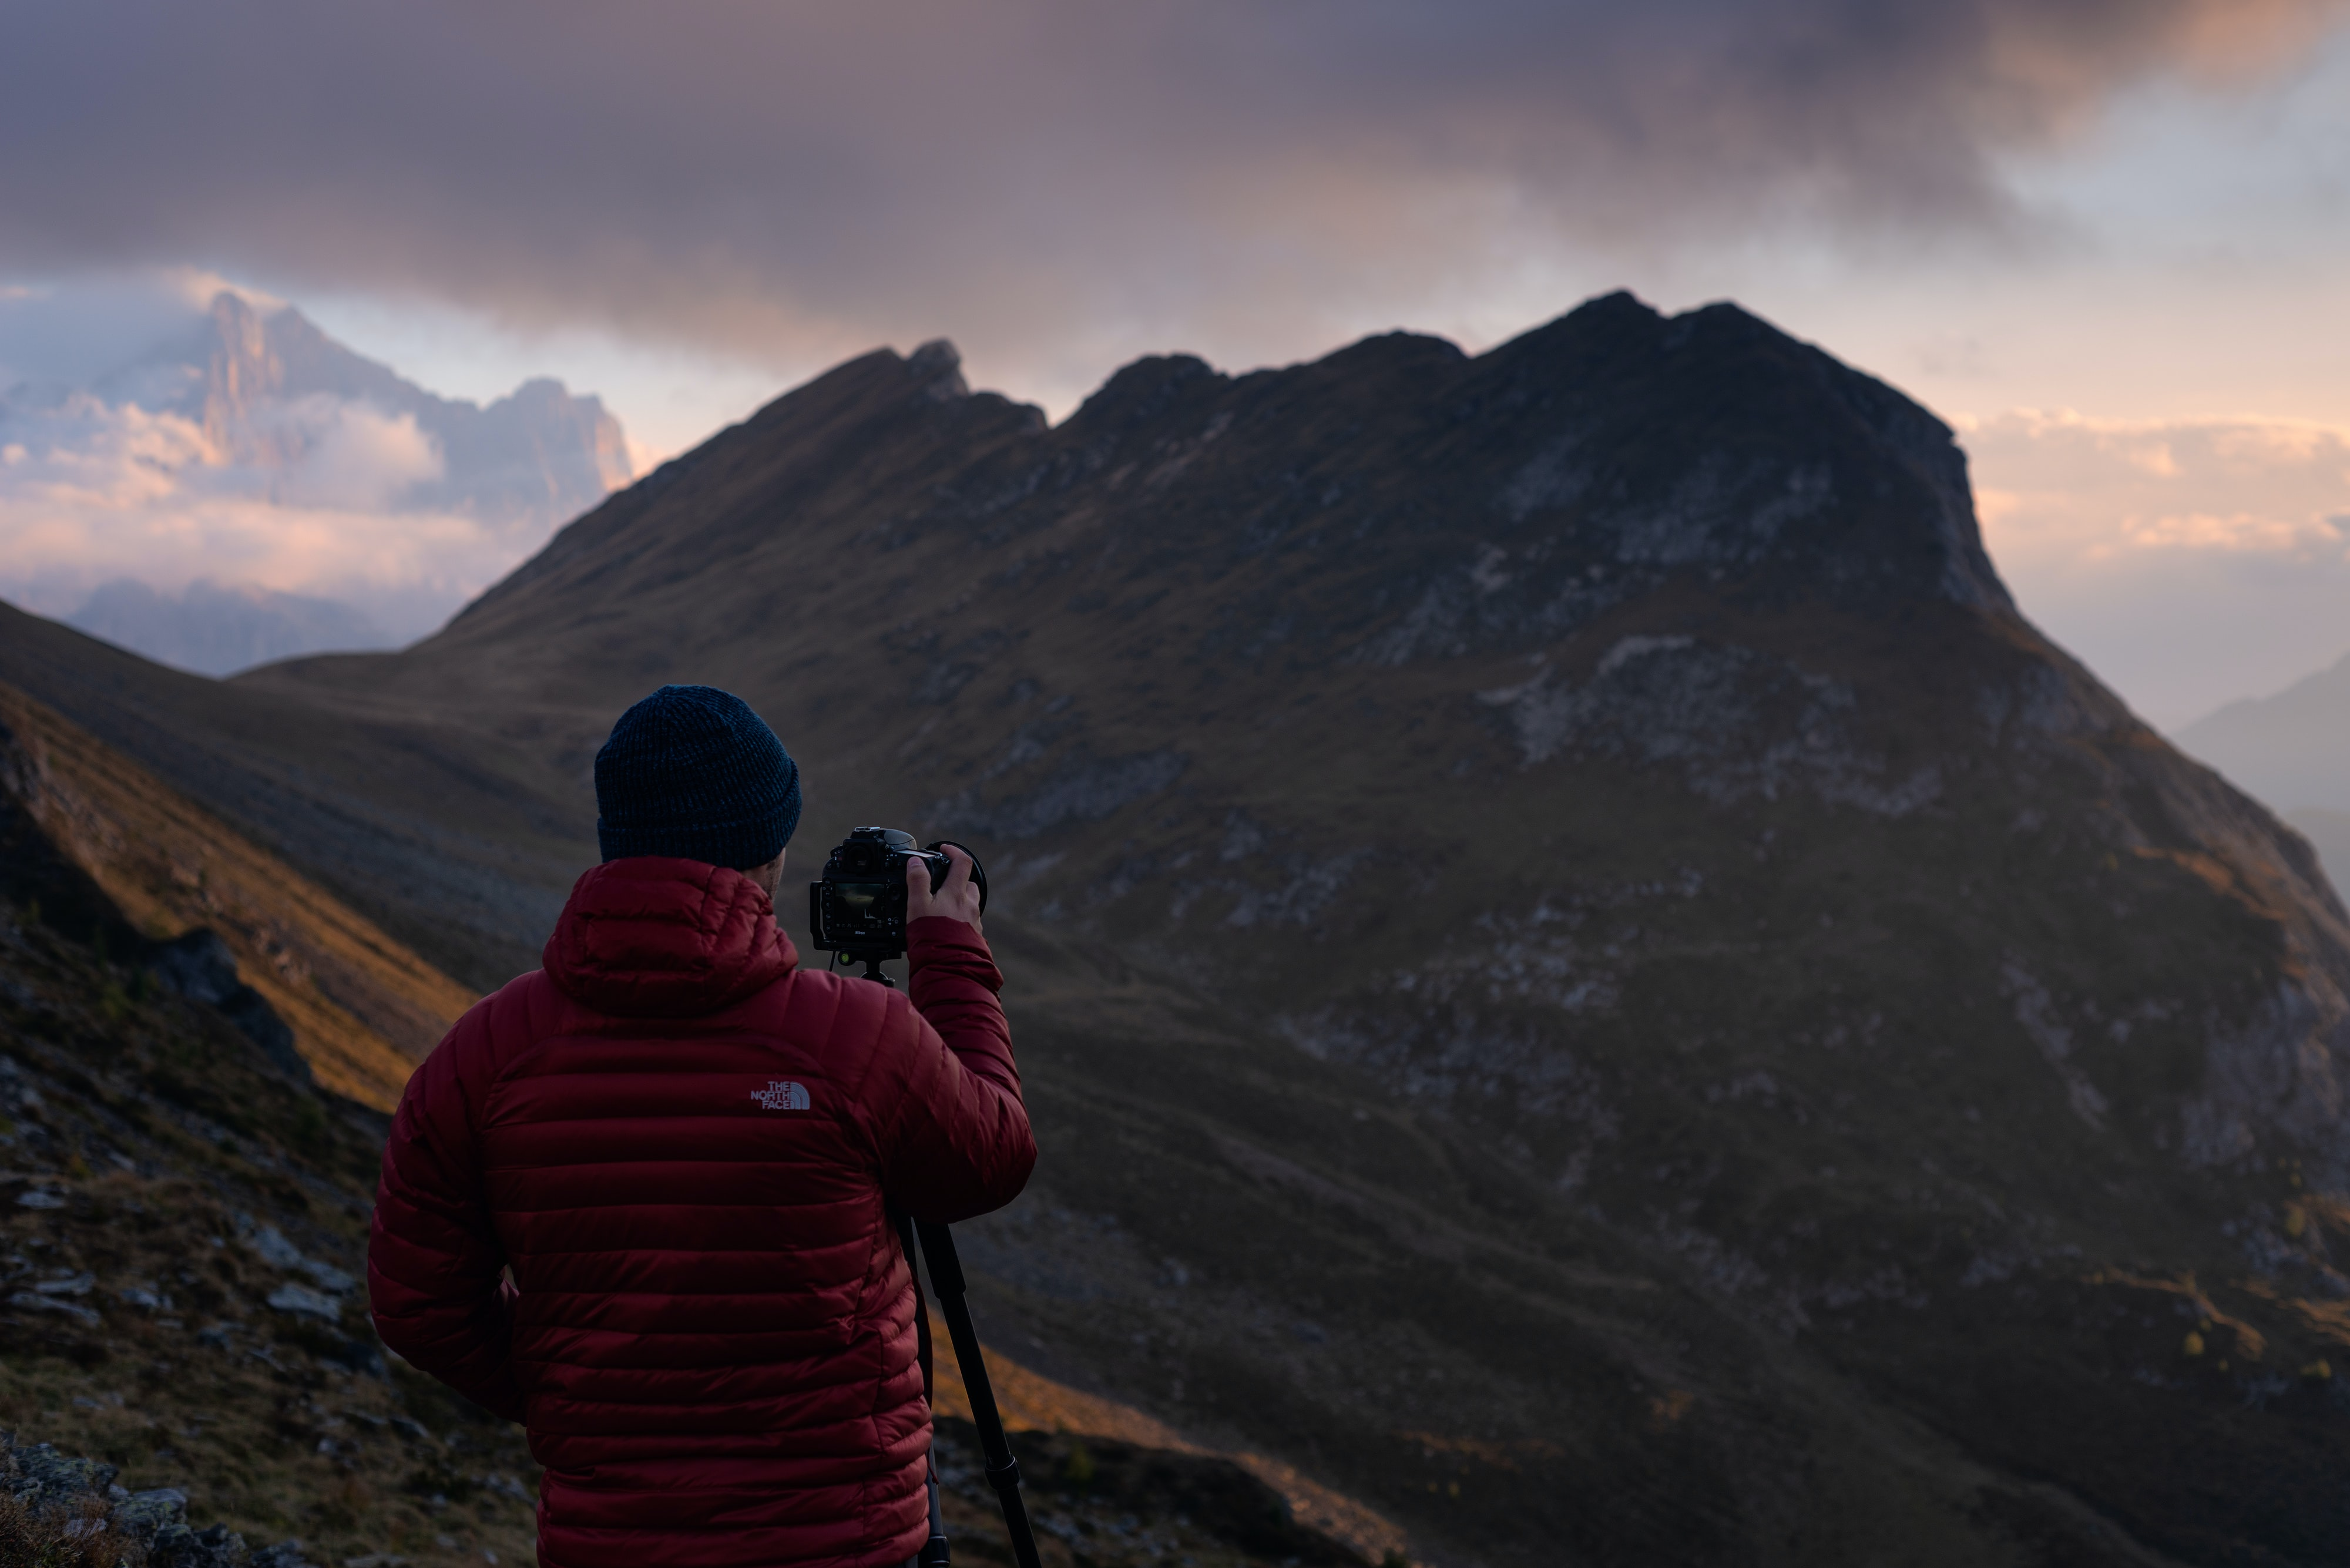 man aiming camera on mountain range